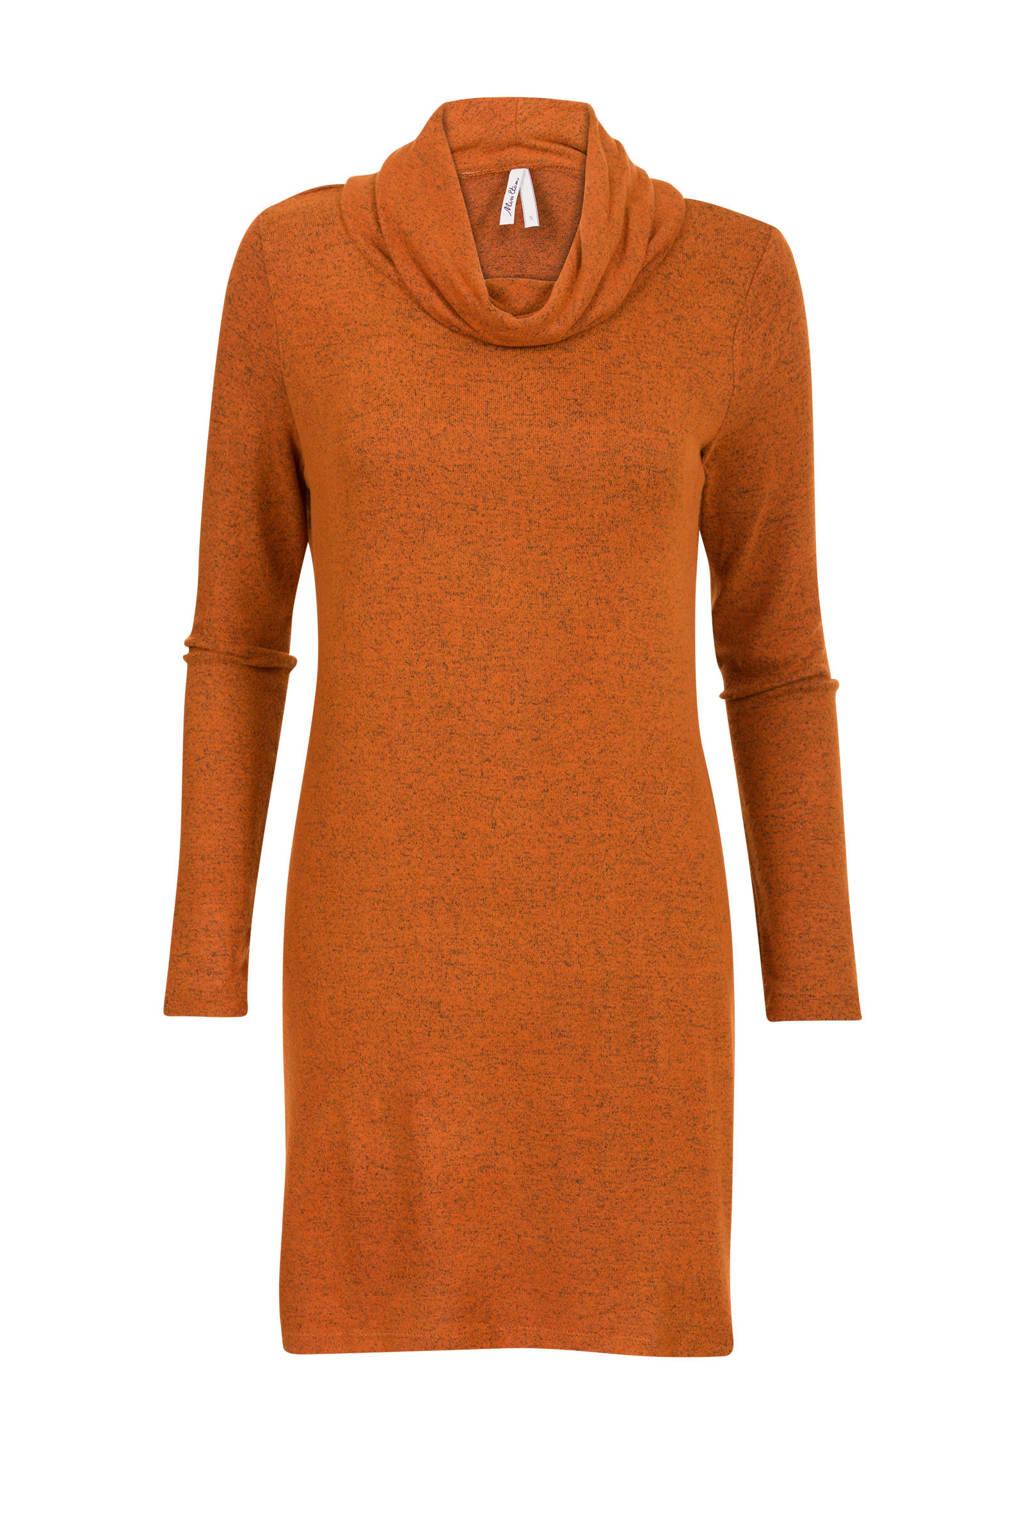 Miss Etam Regulier jurk bruin, Bruin